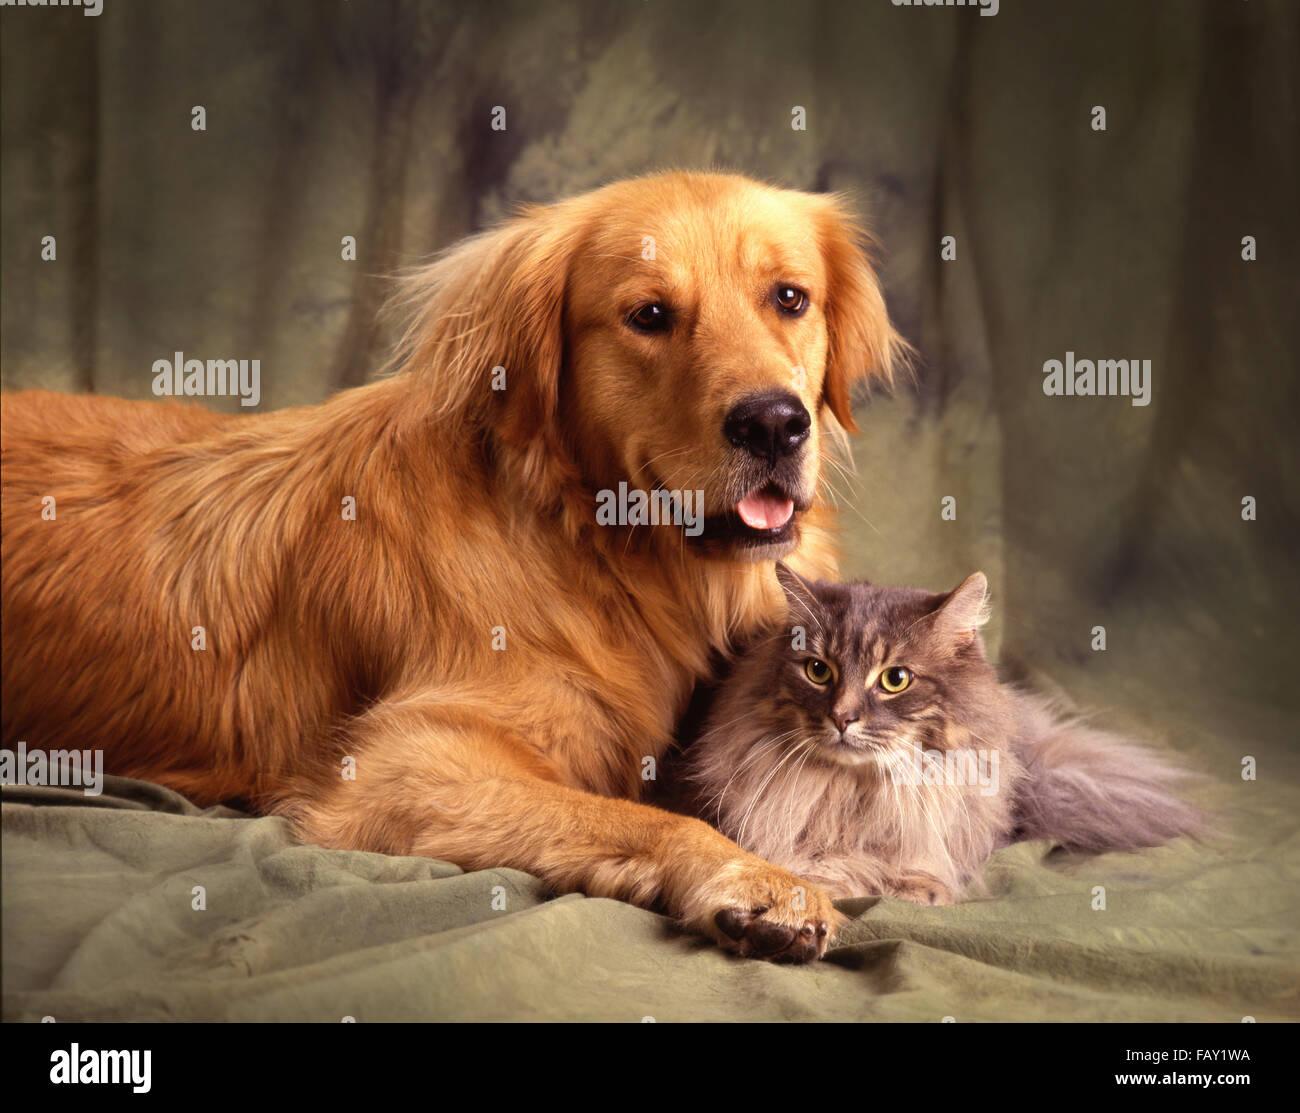 Persian cat and golden retriever